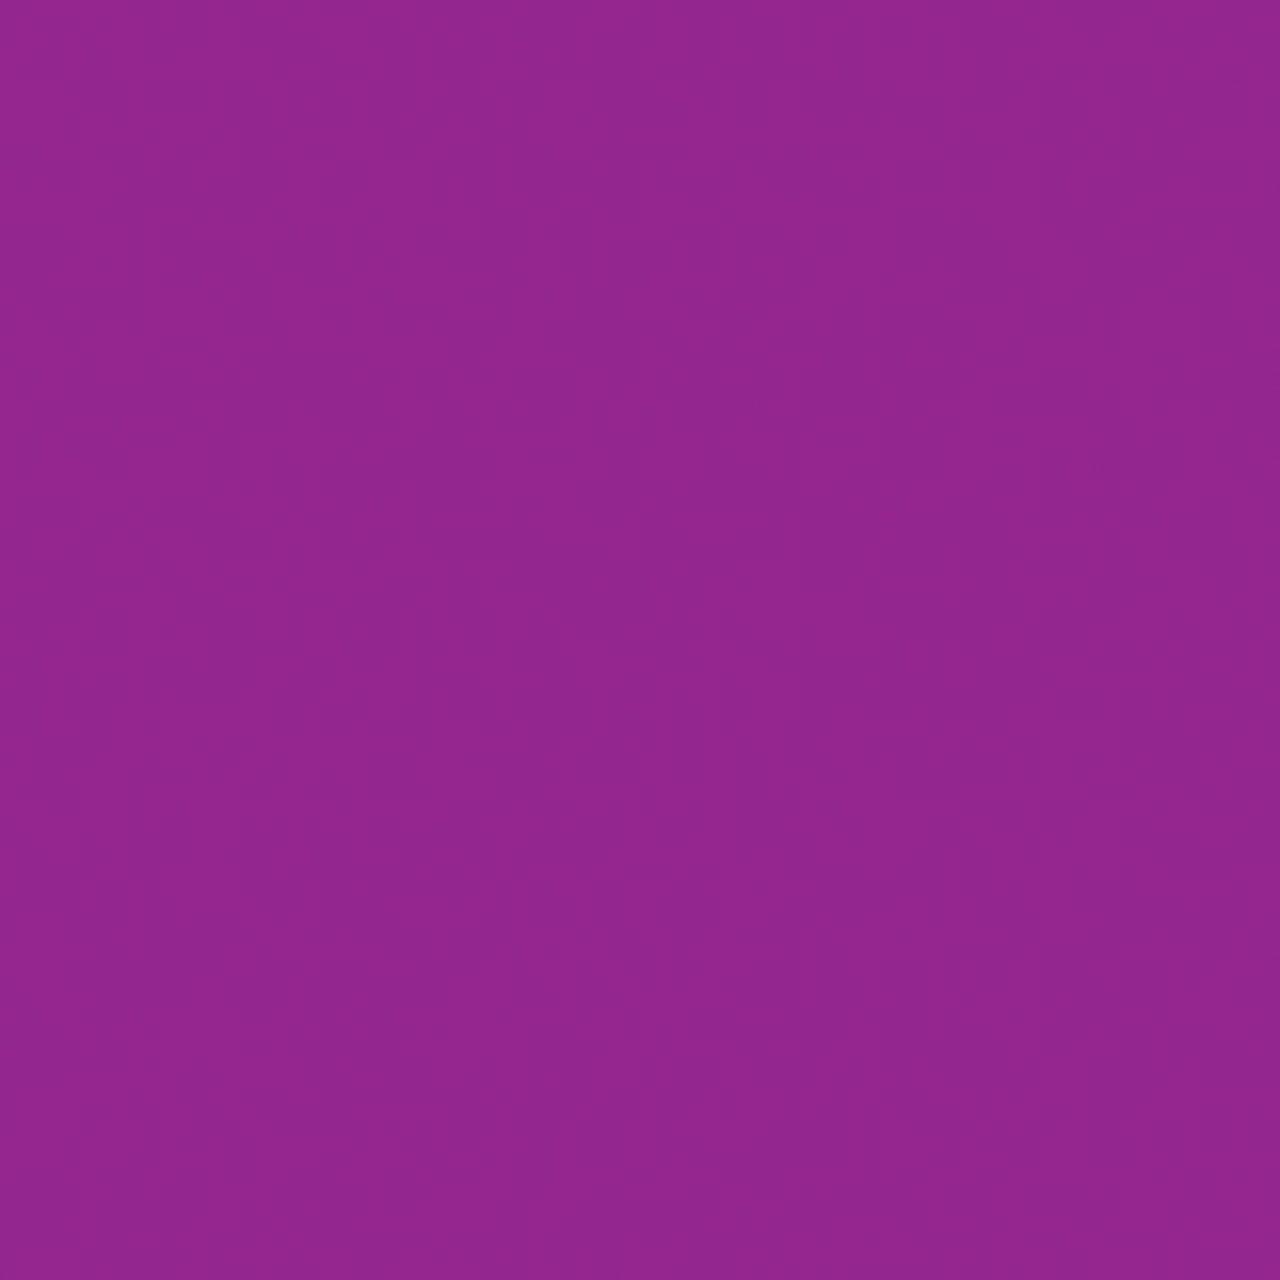 Rosco Calcolor Sheet #4760: 60 Magenta, Gels